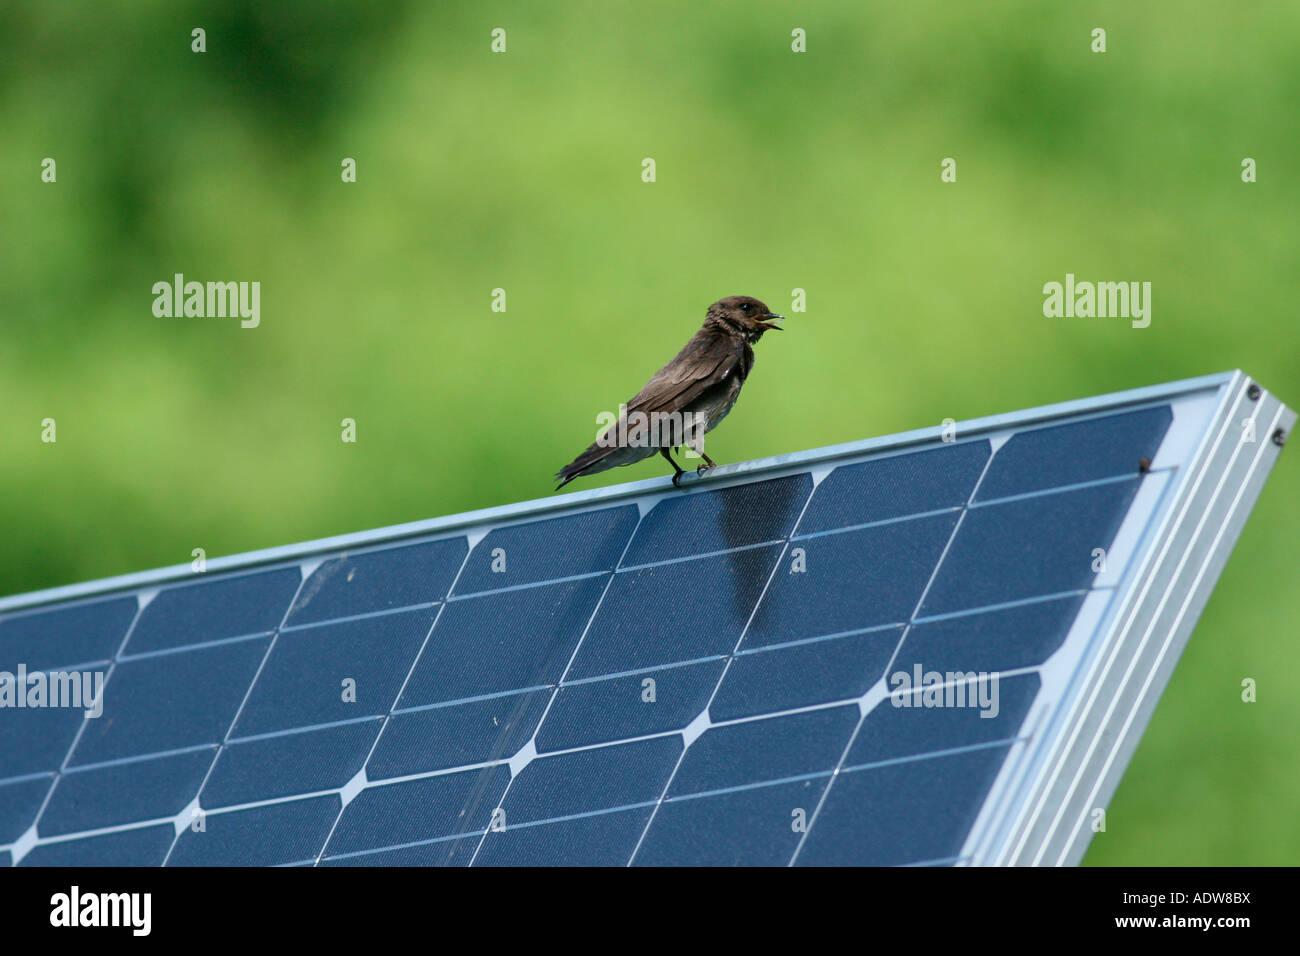 Banco tragar descansando sobre panel solar pico abierto Imagen De Stock